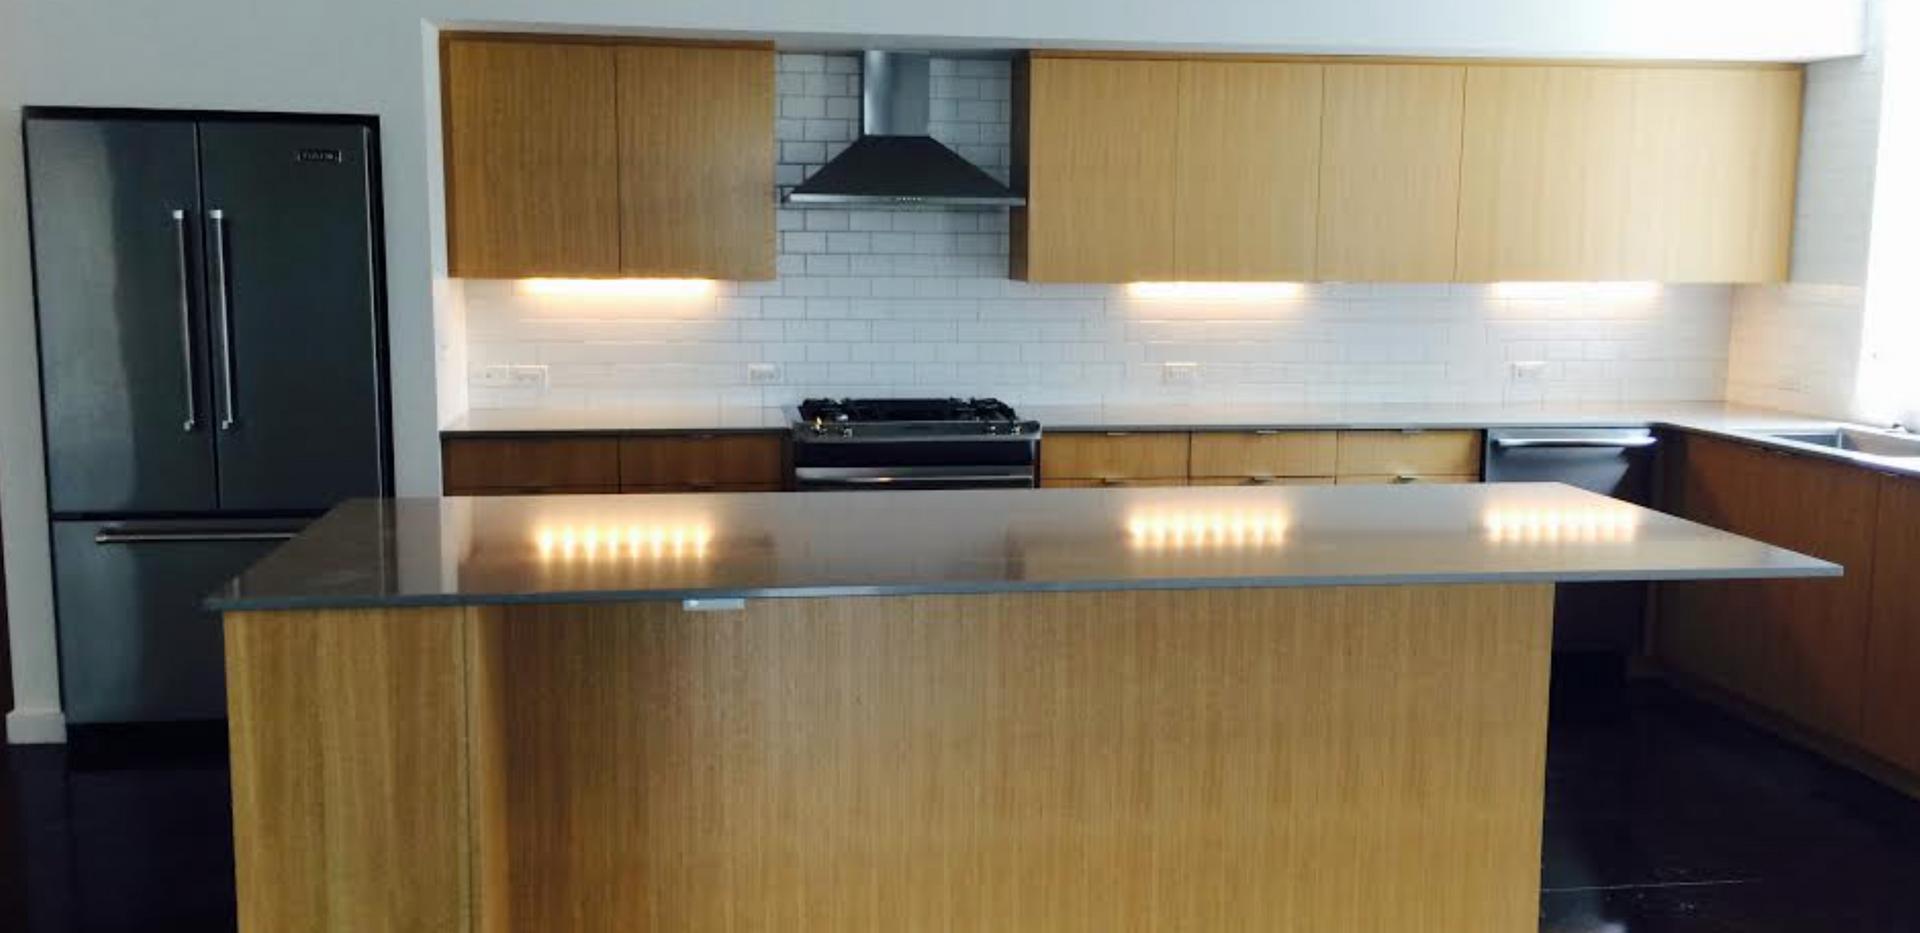 Studio 209 Kitchen 2.png